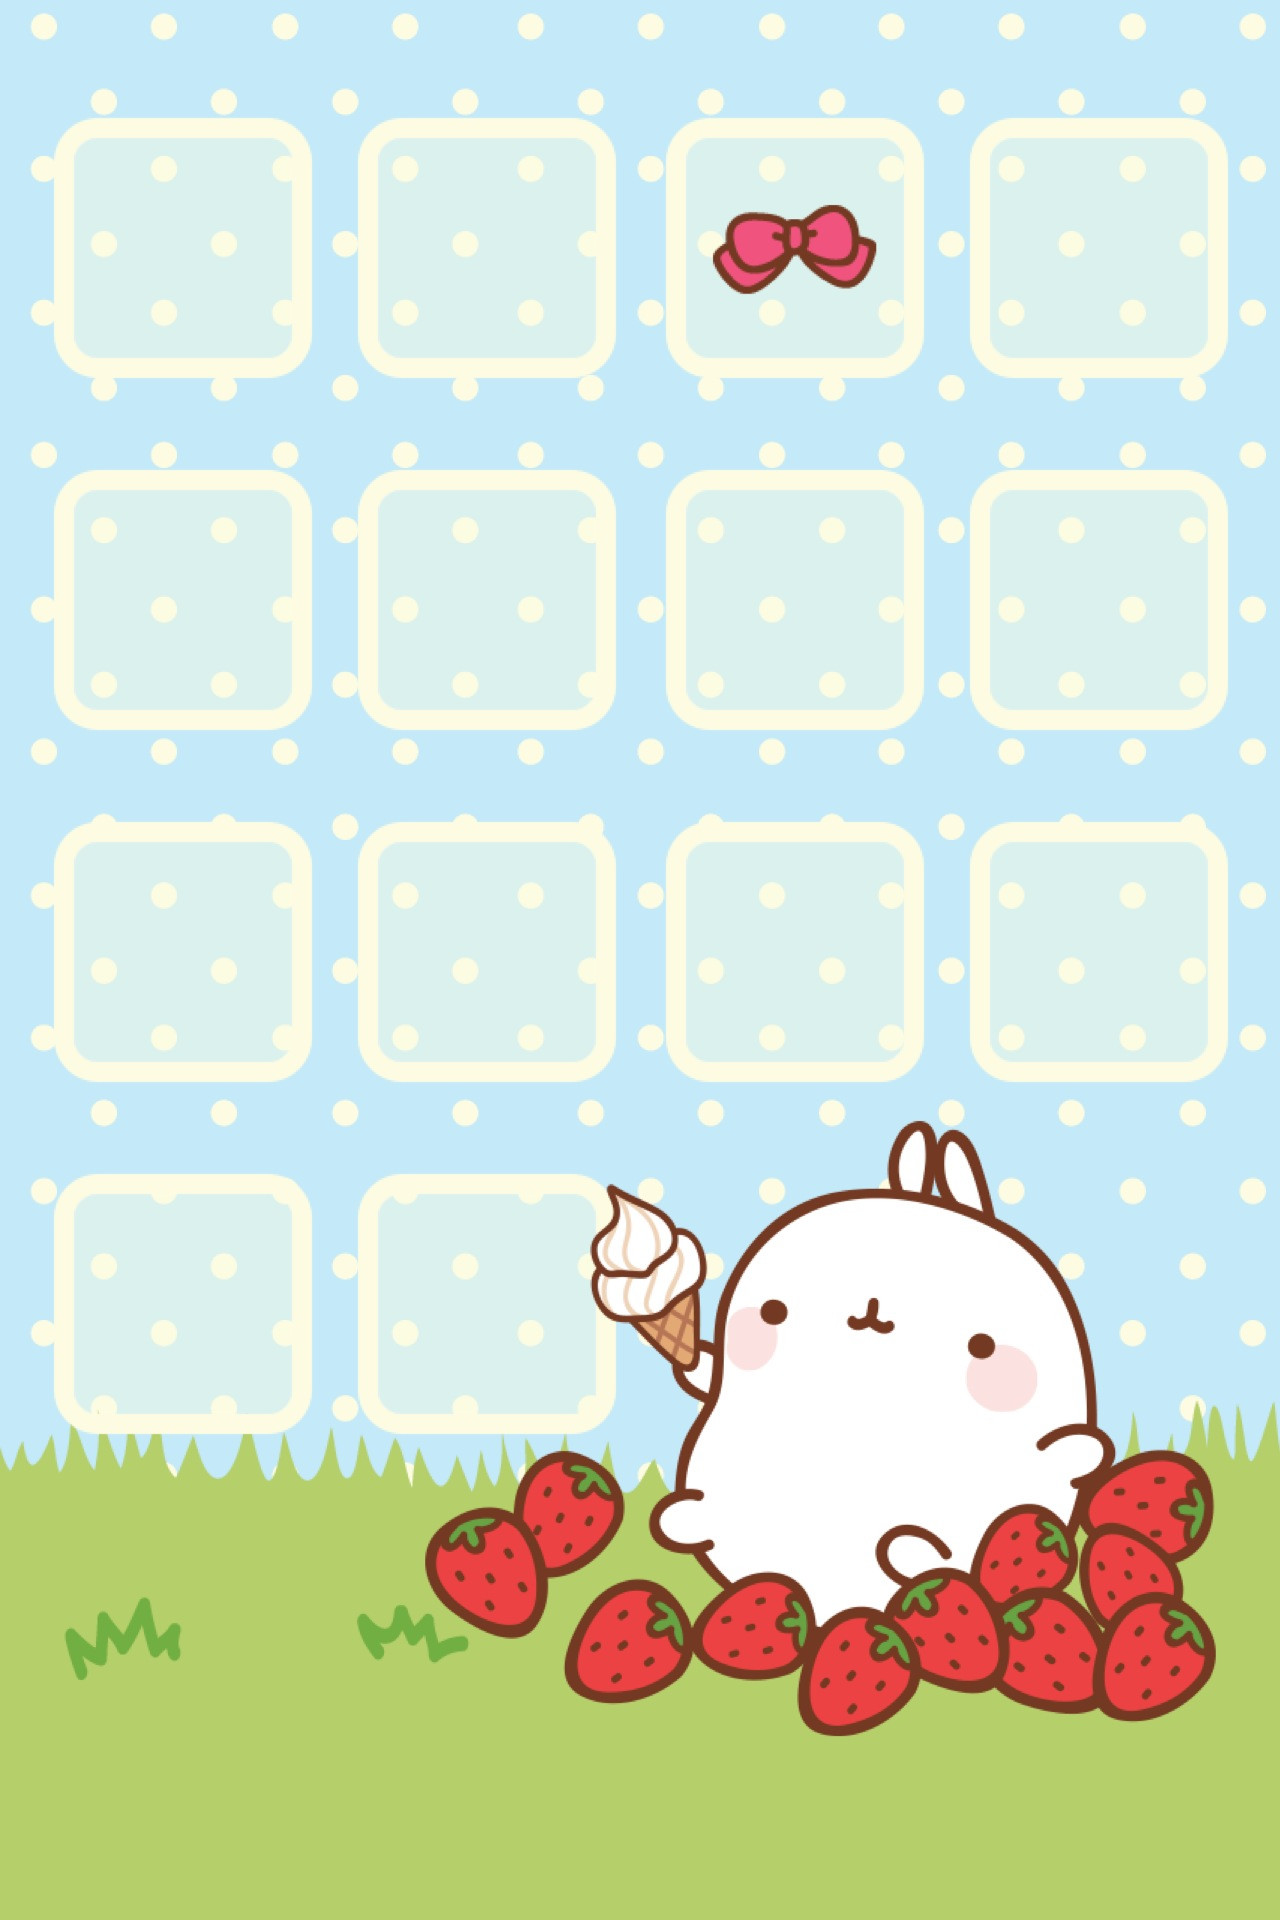 Most Inspiring Wallpaper Home Screen Emoji - 246718  Image_232278.jpg